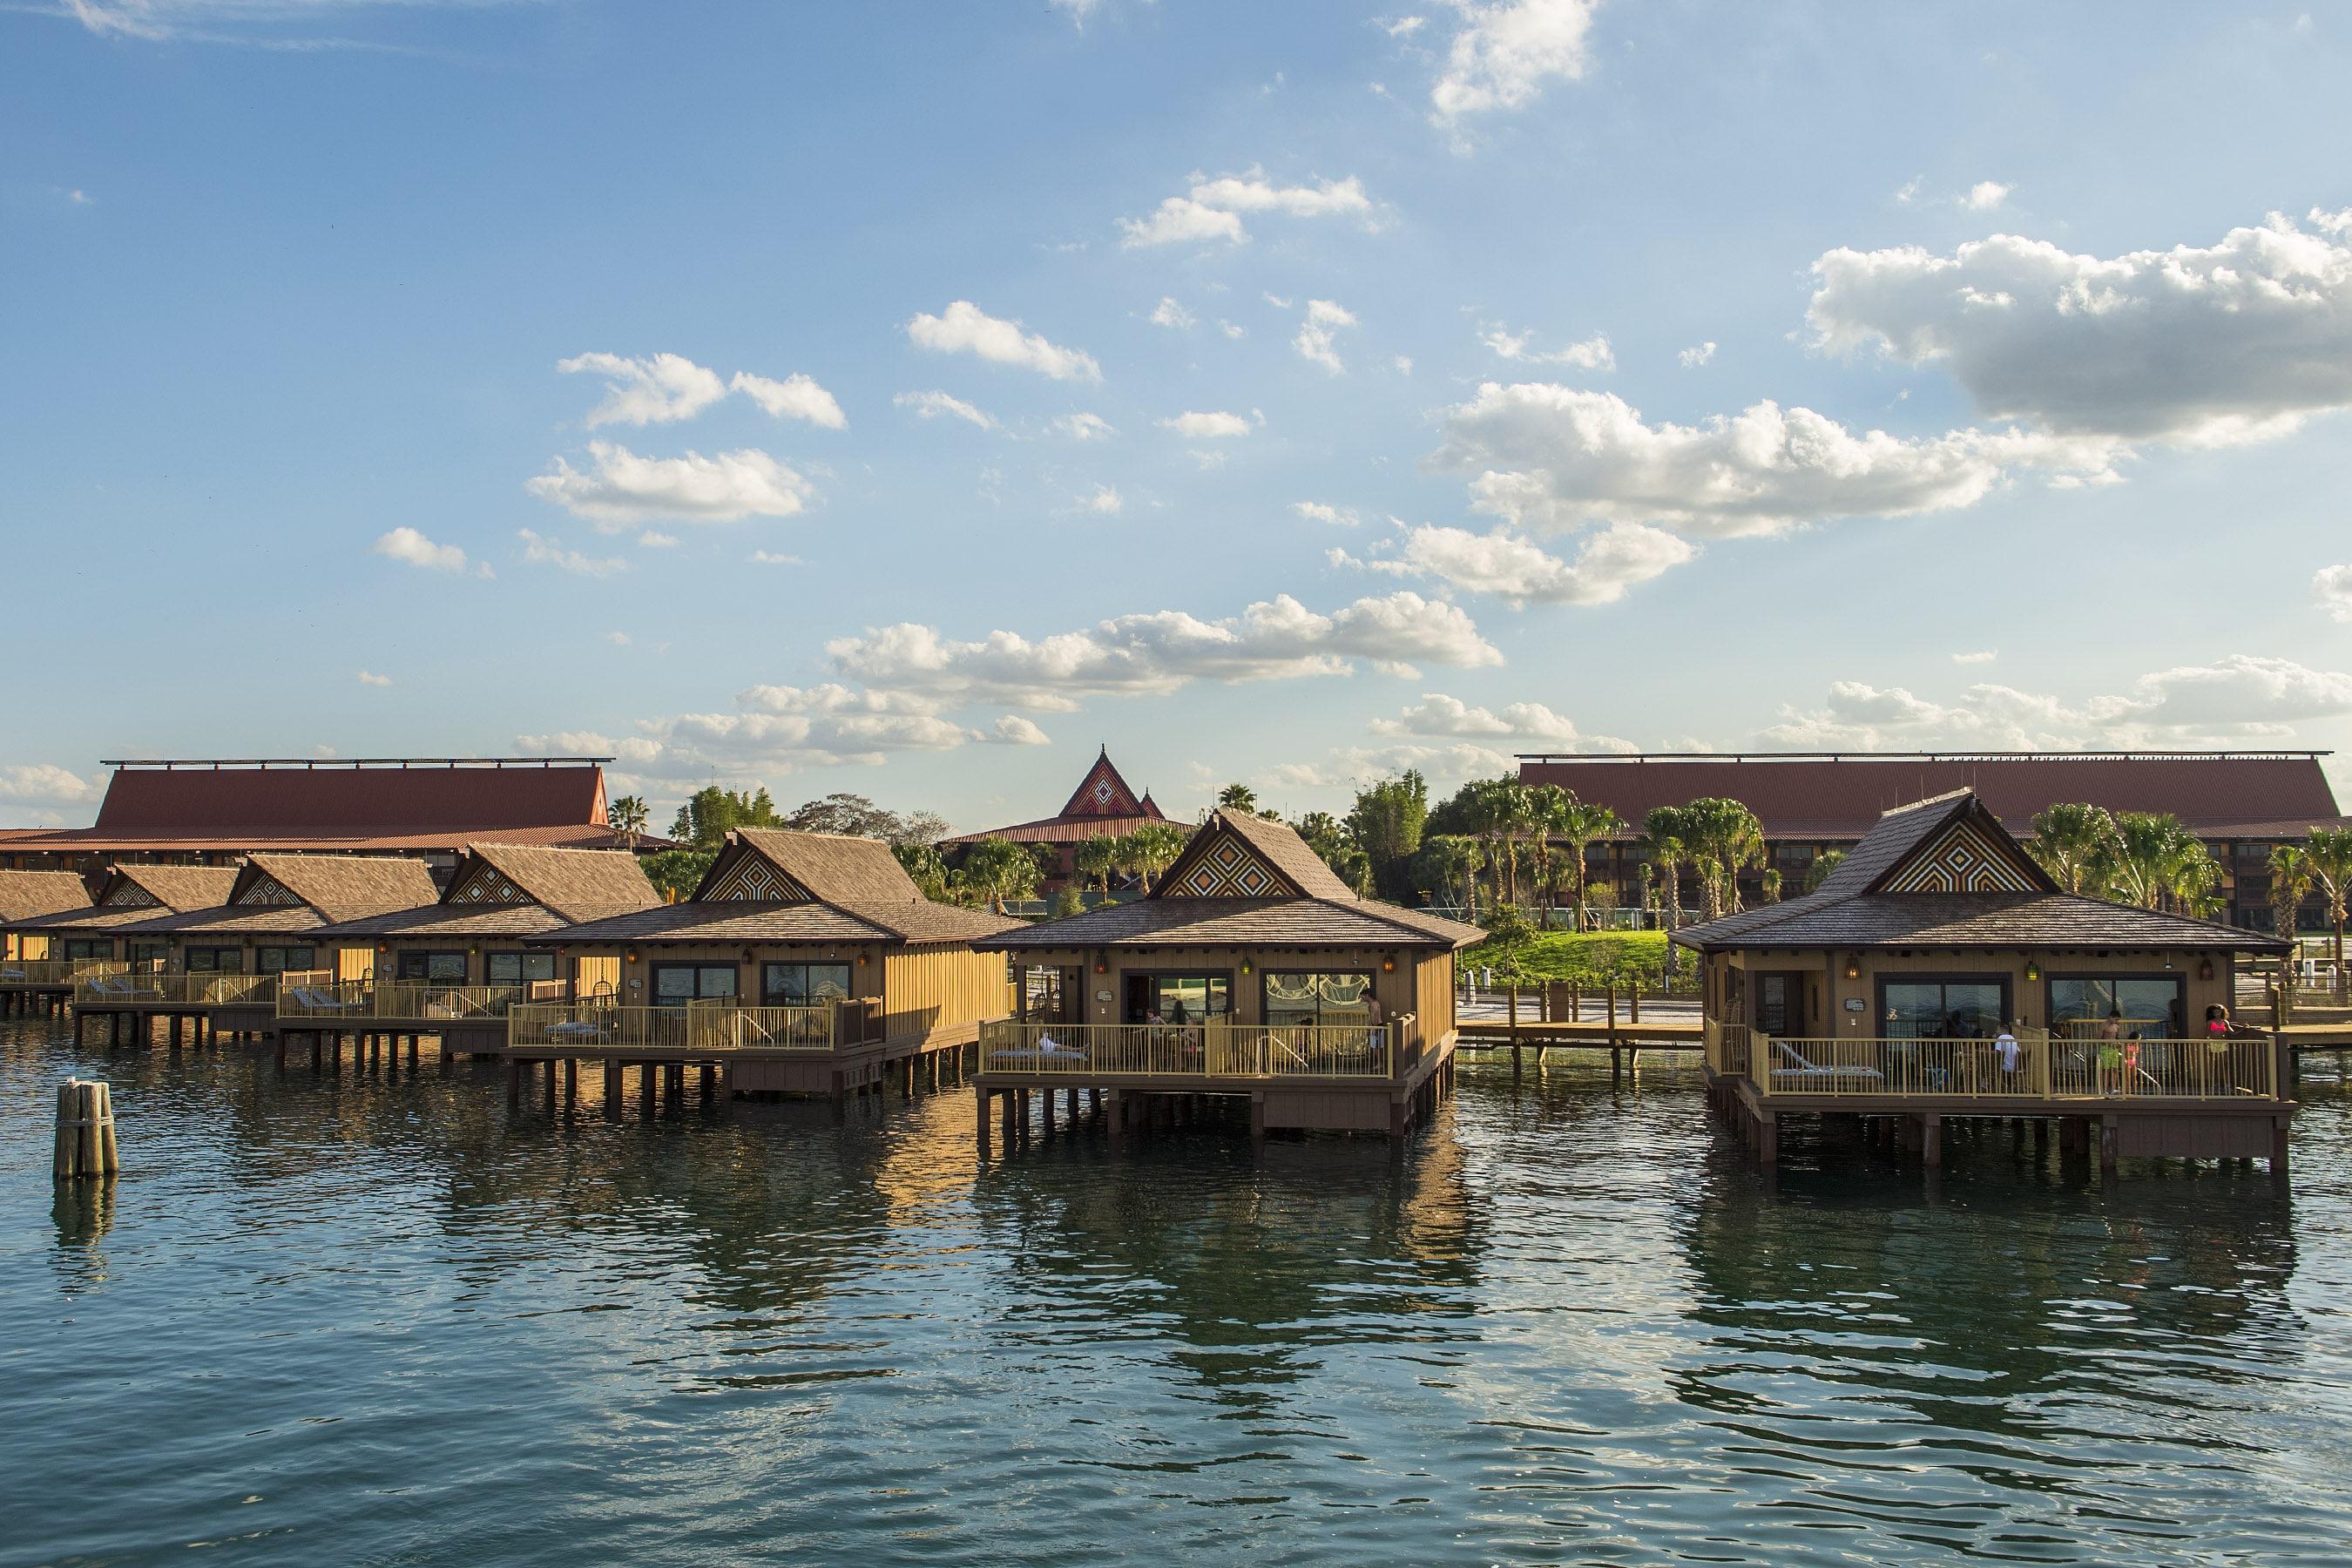 Disney Deluxe Resorts Disneys Polynesian Village resort